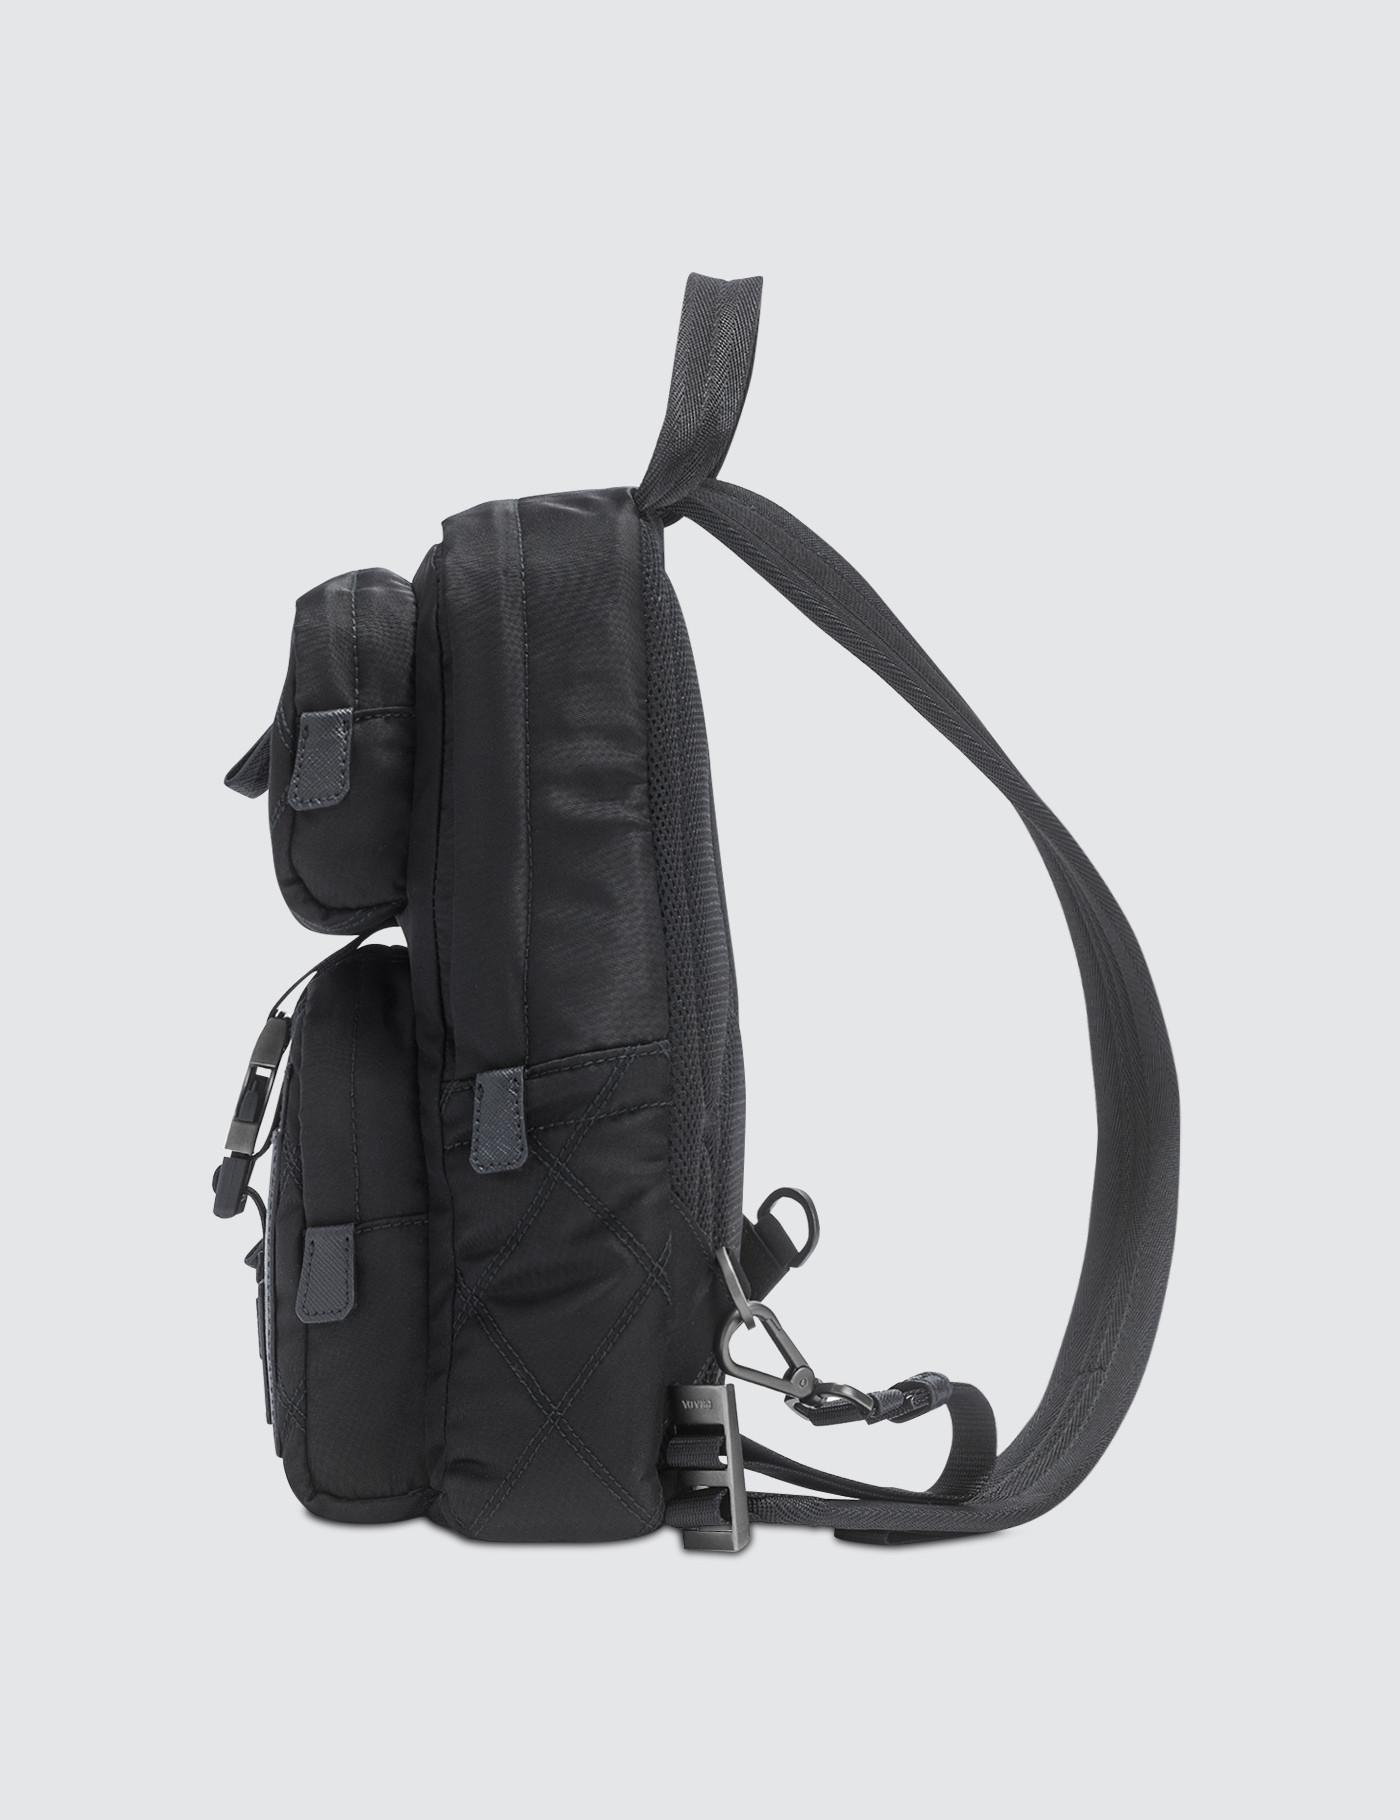 9a2dc2b57eafbd Mens One Shoulder Strap Backpack- Fenix Toulouse Handball